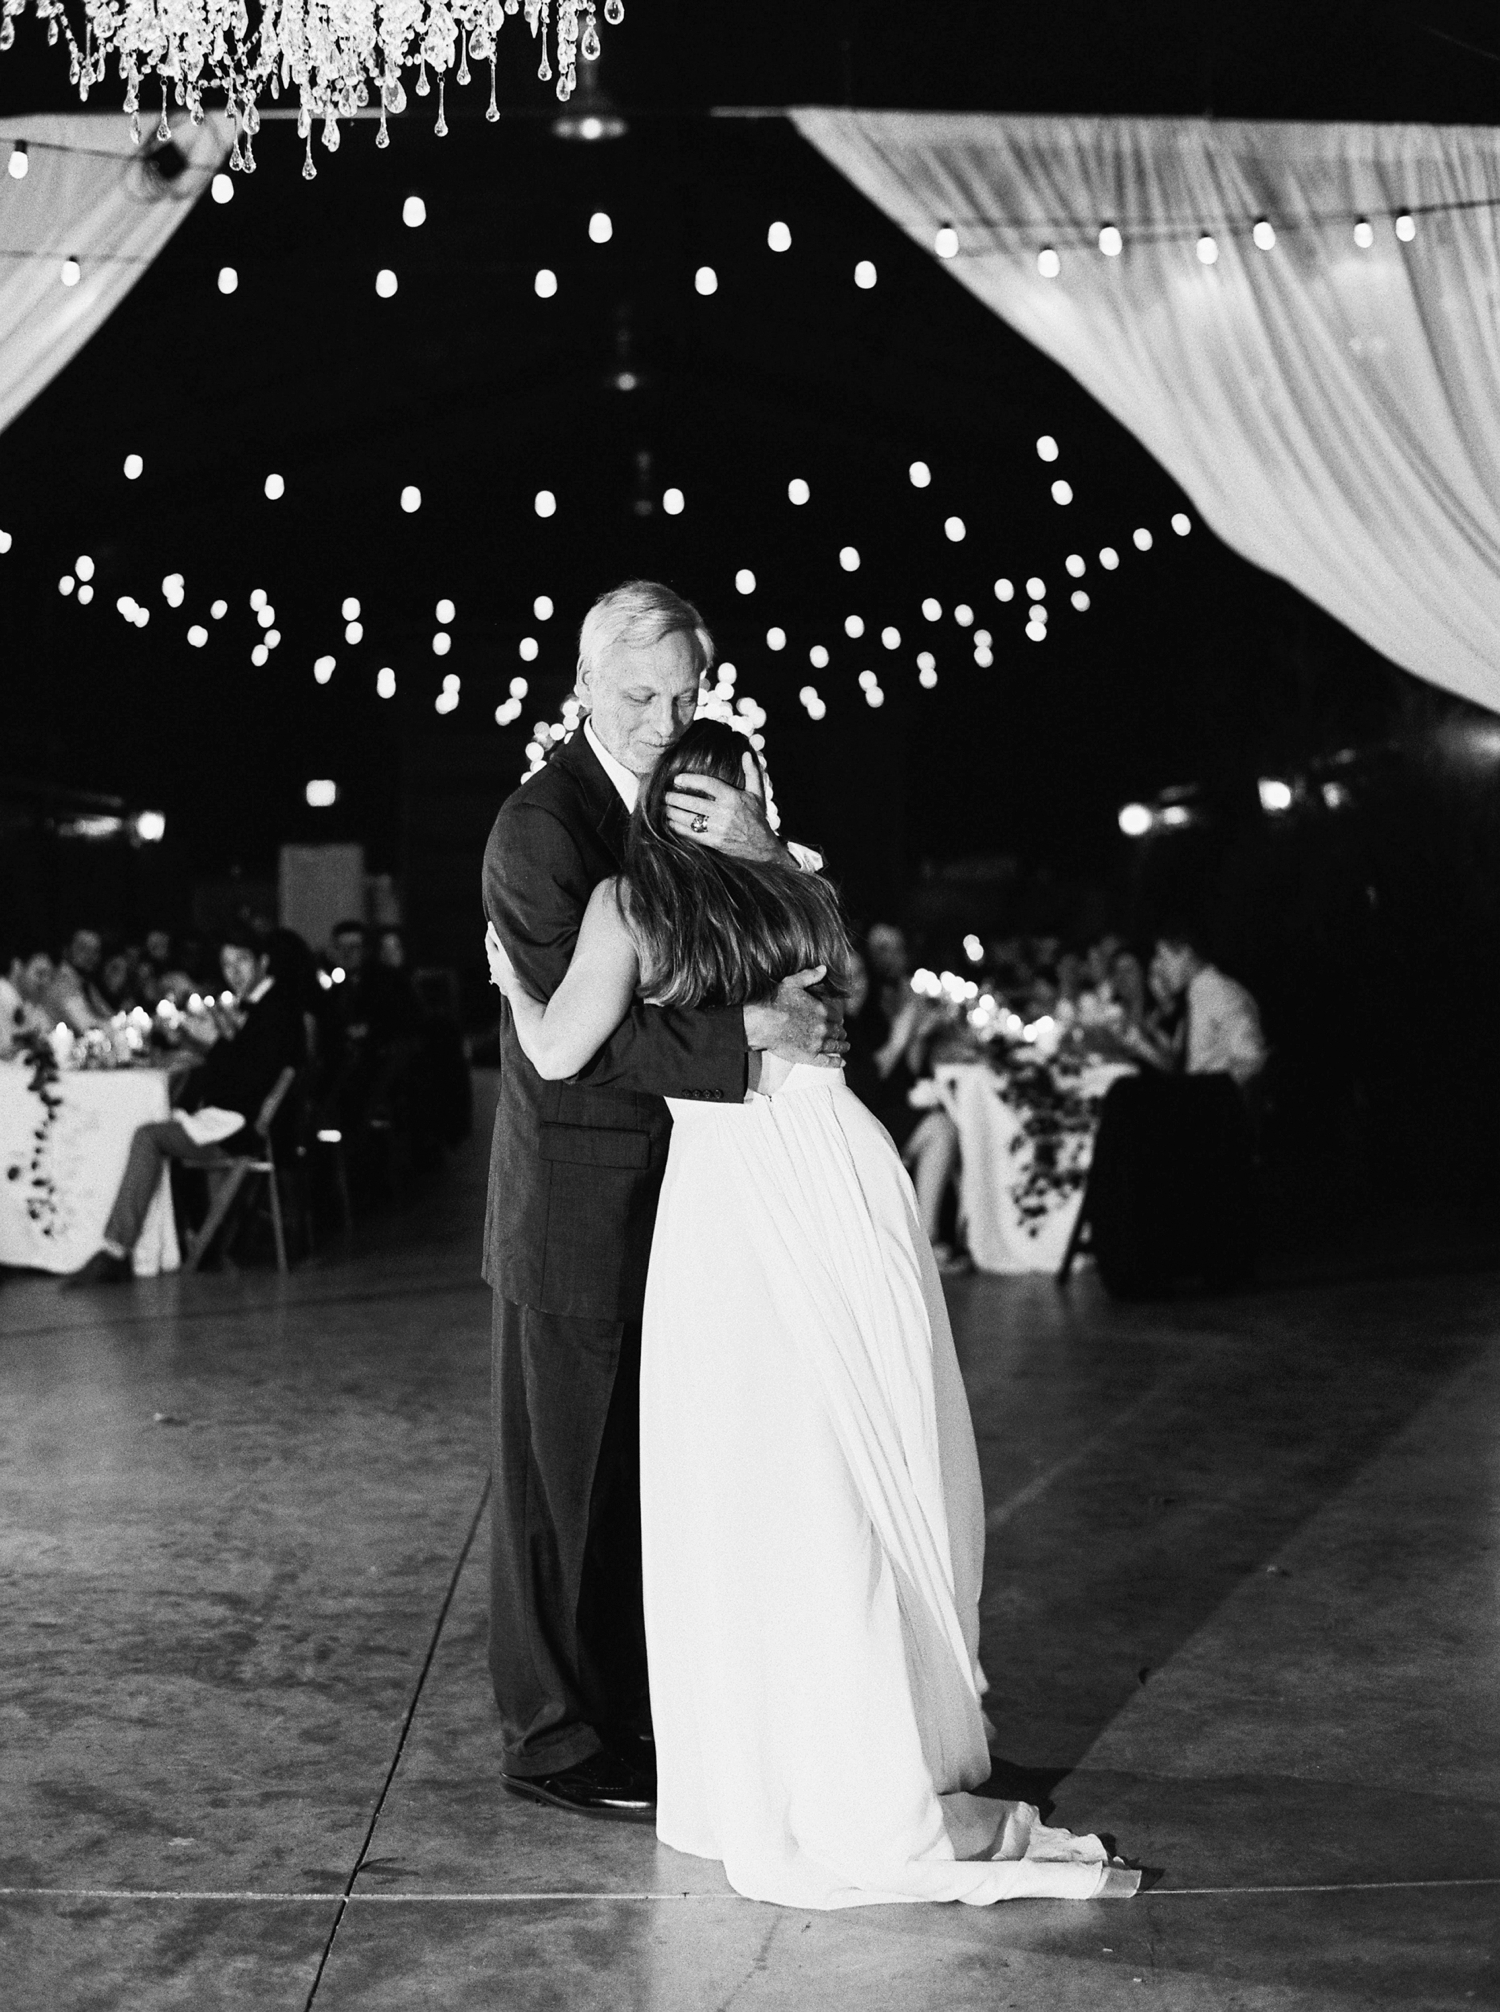 Calgary wedding photographers | georgia wedding photographers | fine art film | Justine Milton Photography | georgia wedding | father daughter dance | portraits | reception |